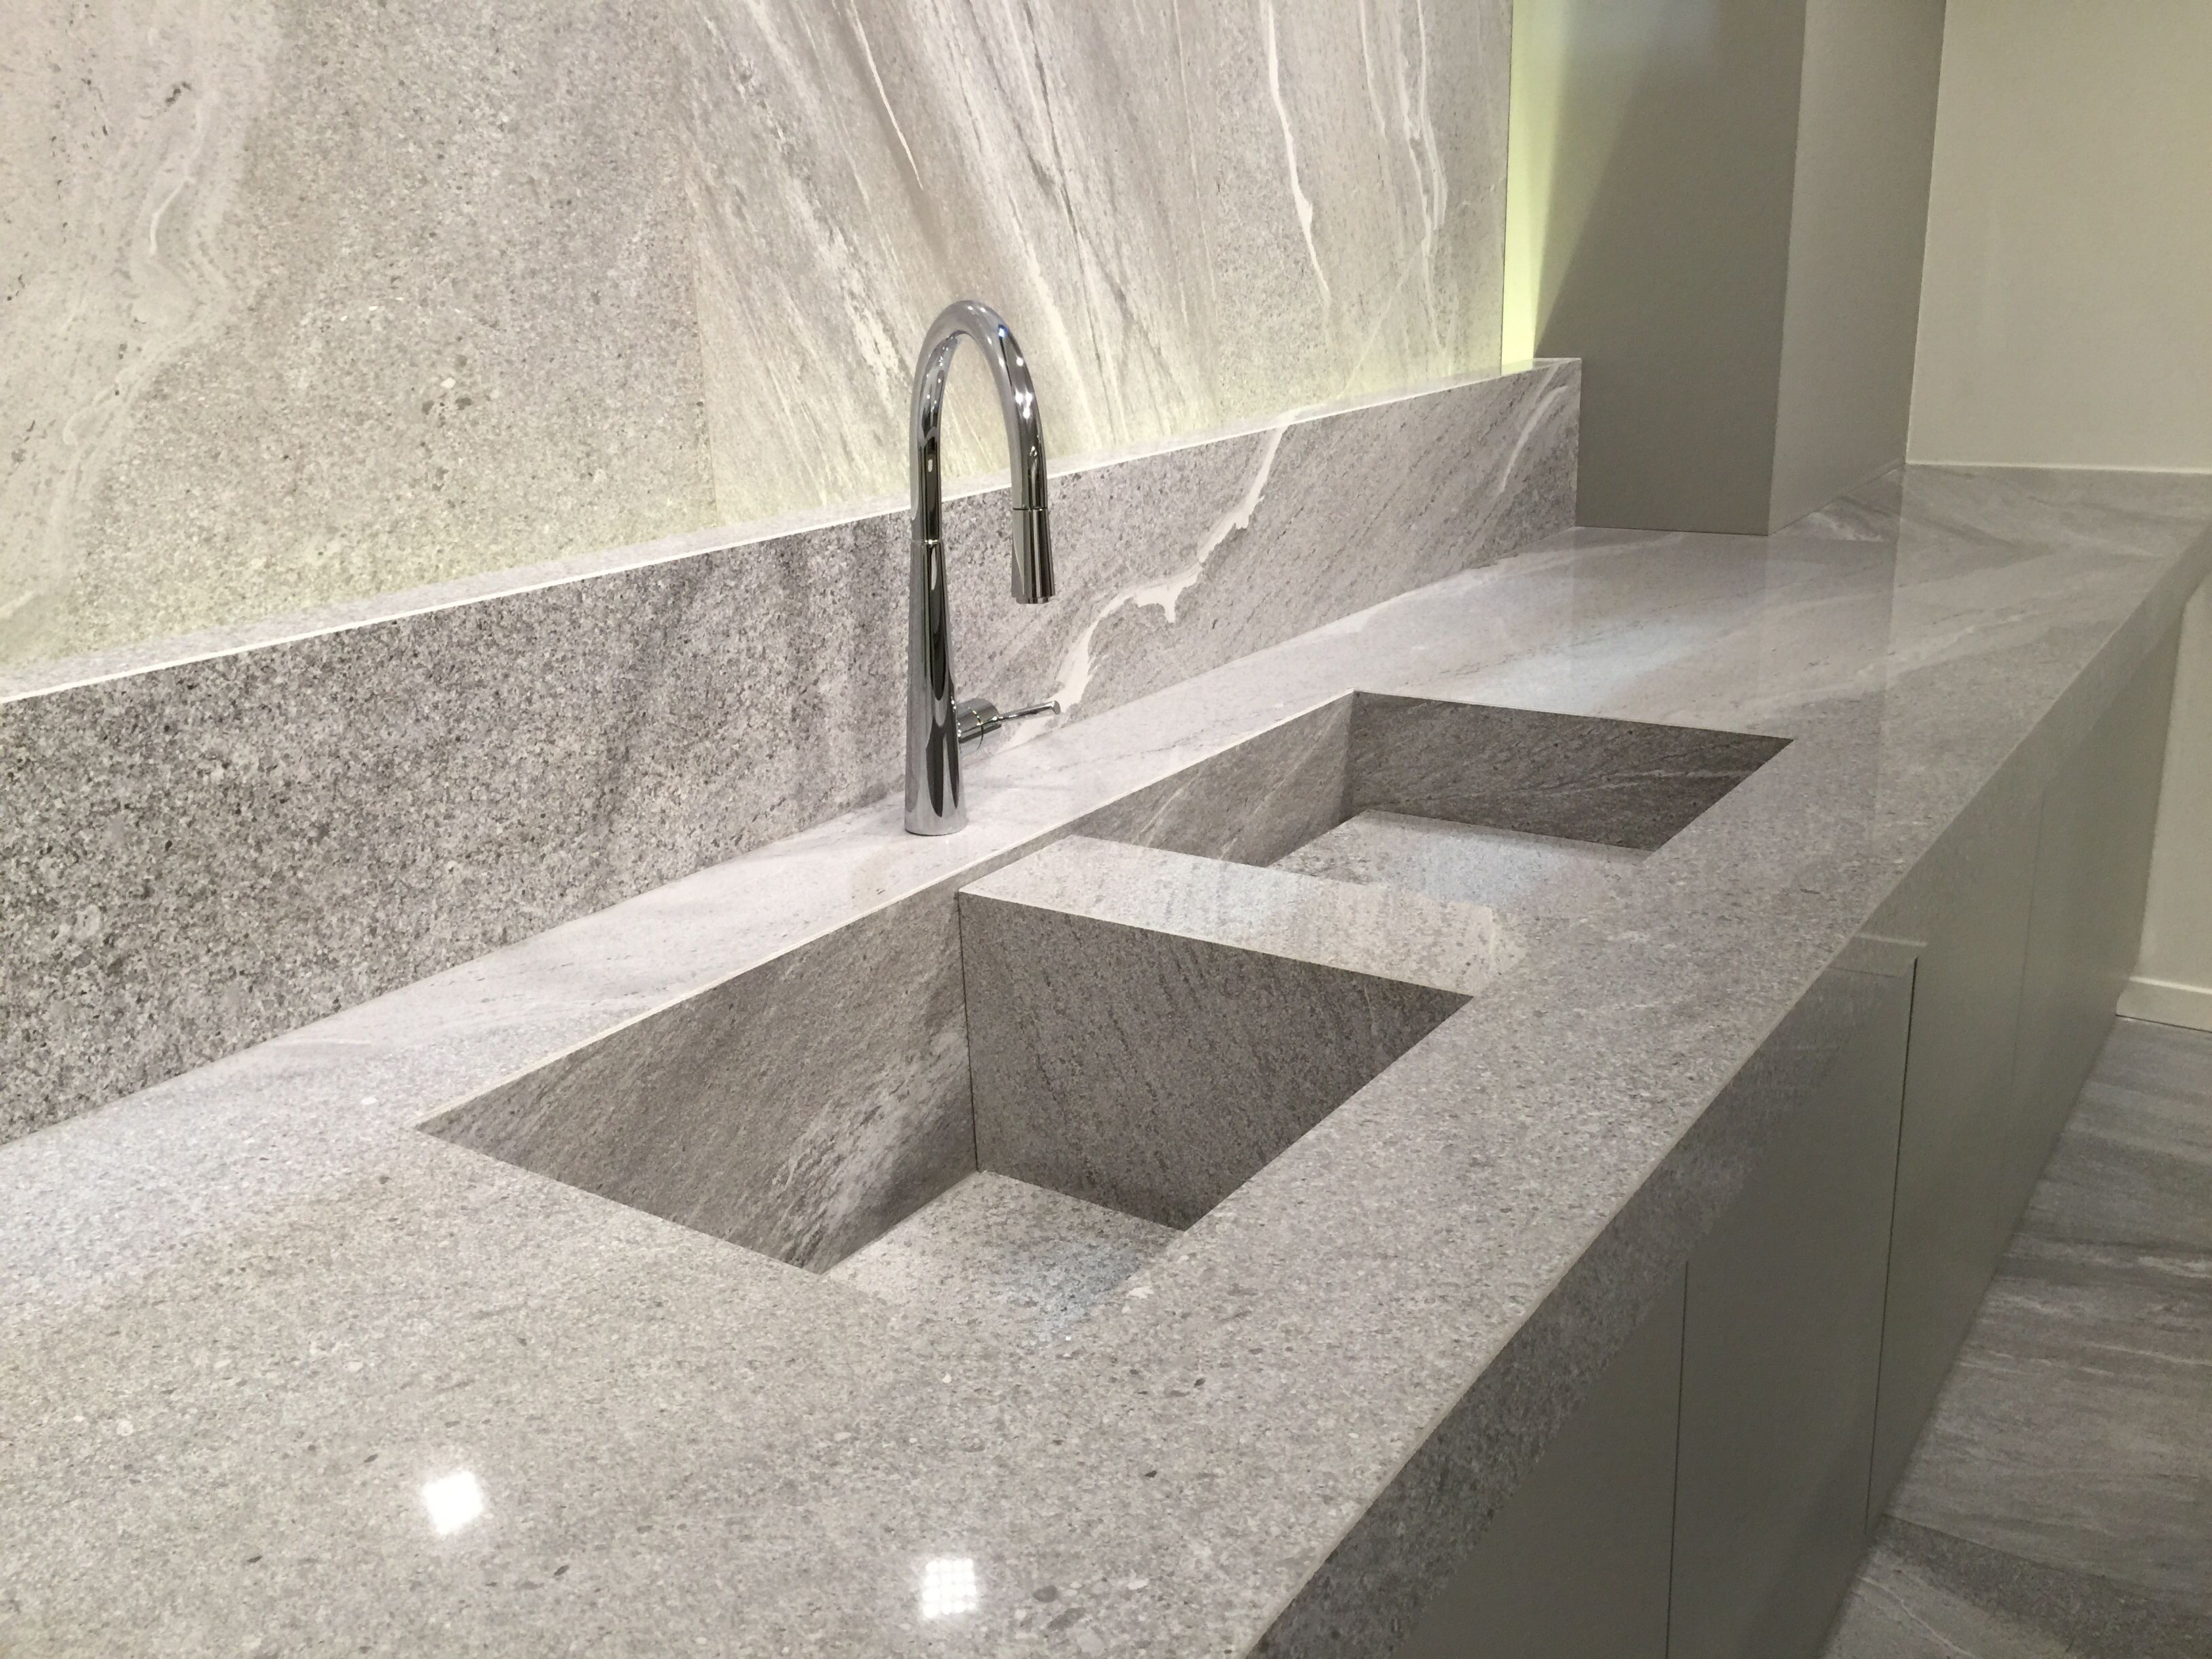 Kama Badezimmermöbel ~ 25 best banyo images on pinterest basement marbles and bathroom